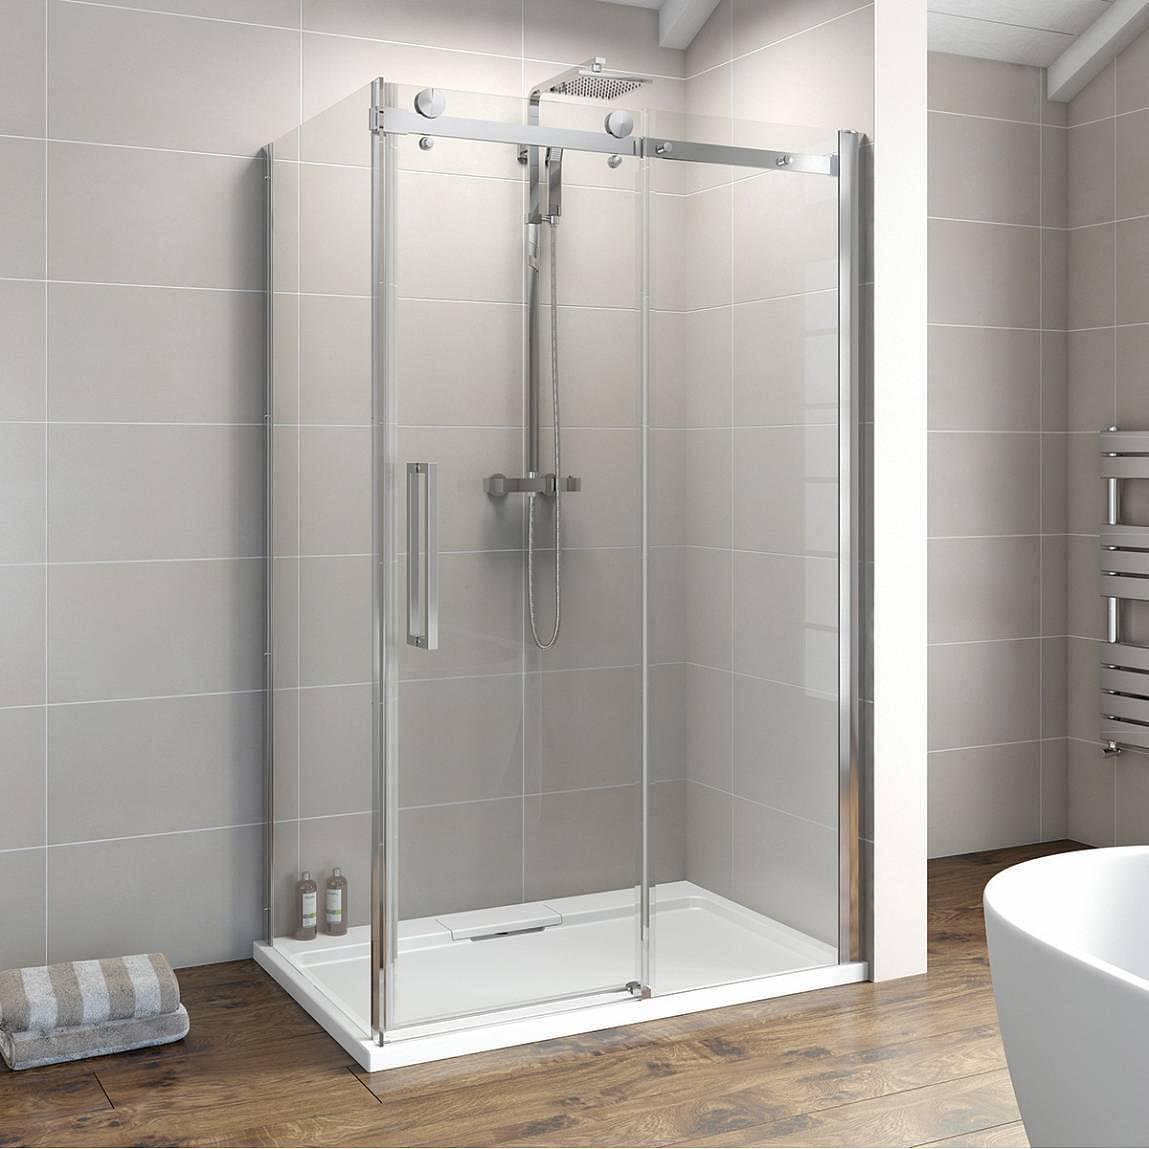 Image of V8+ 8mm Frameless Sliding Shower Enclosure 1200 x 800